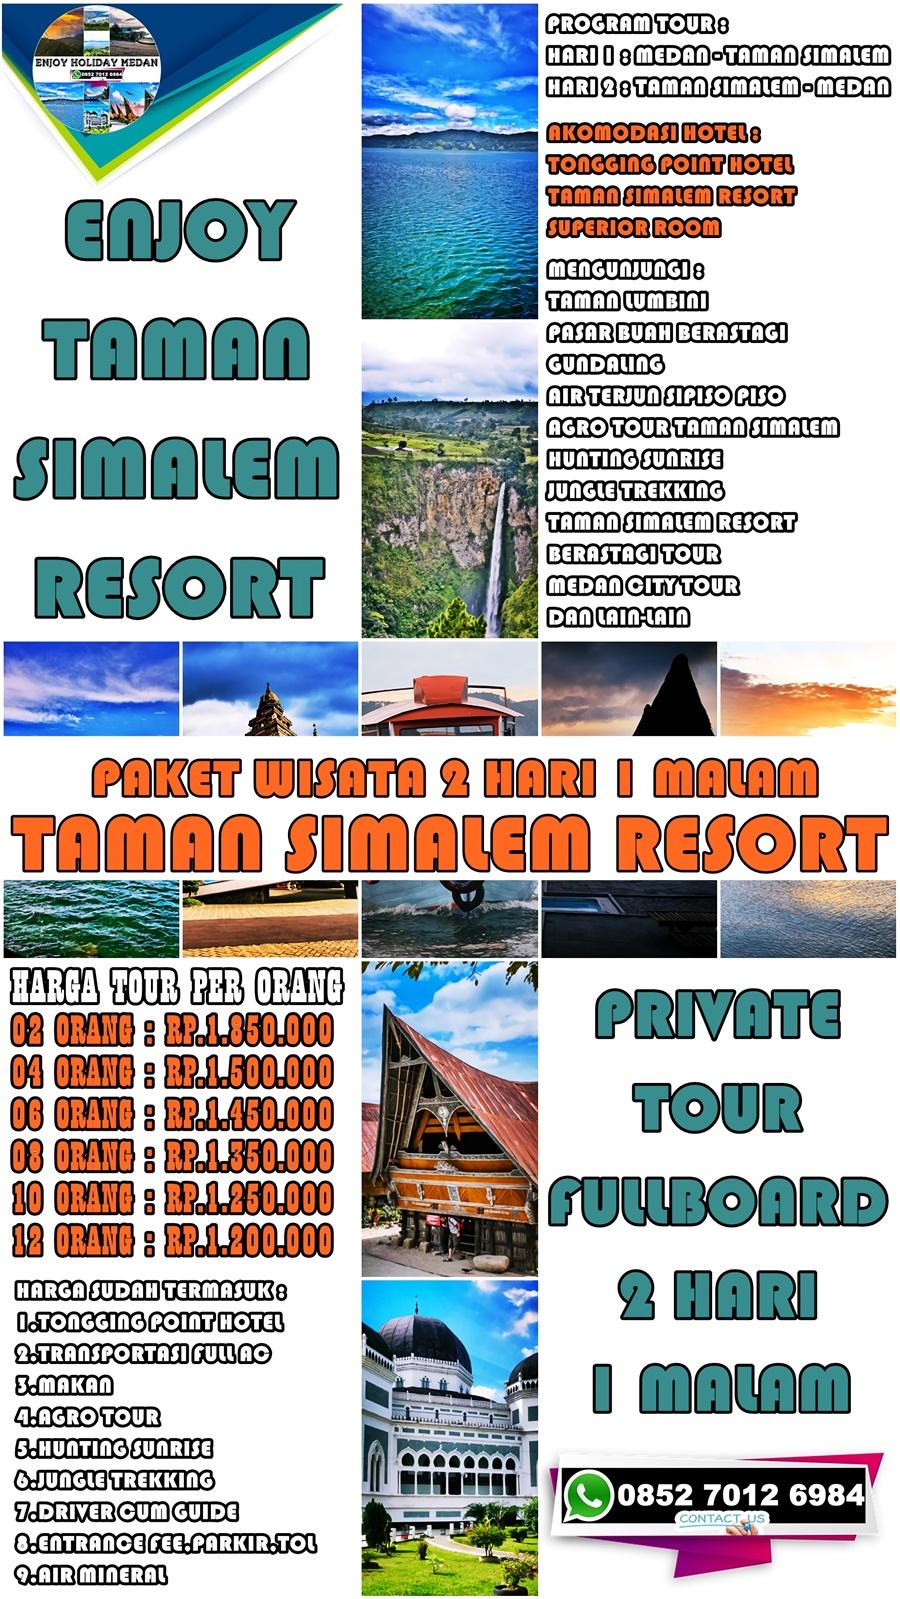 Taman Simalem Resort Tour